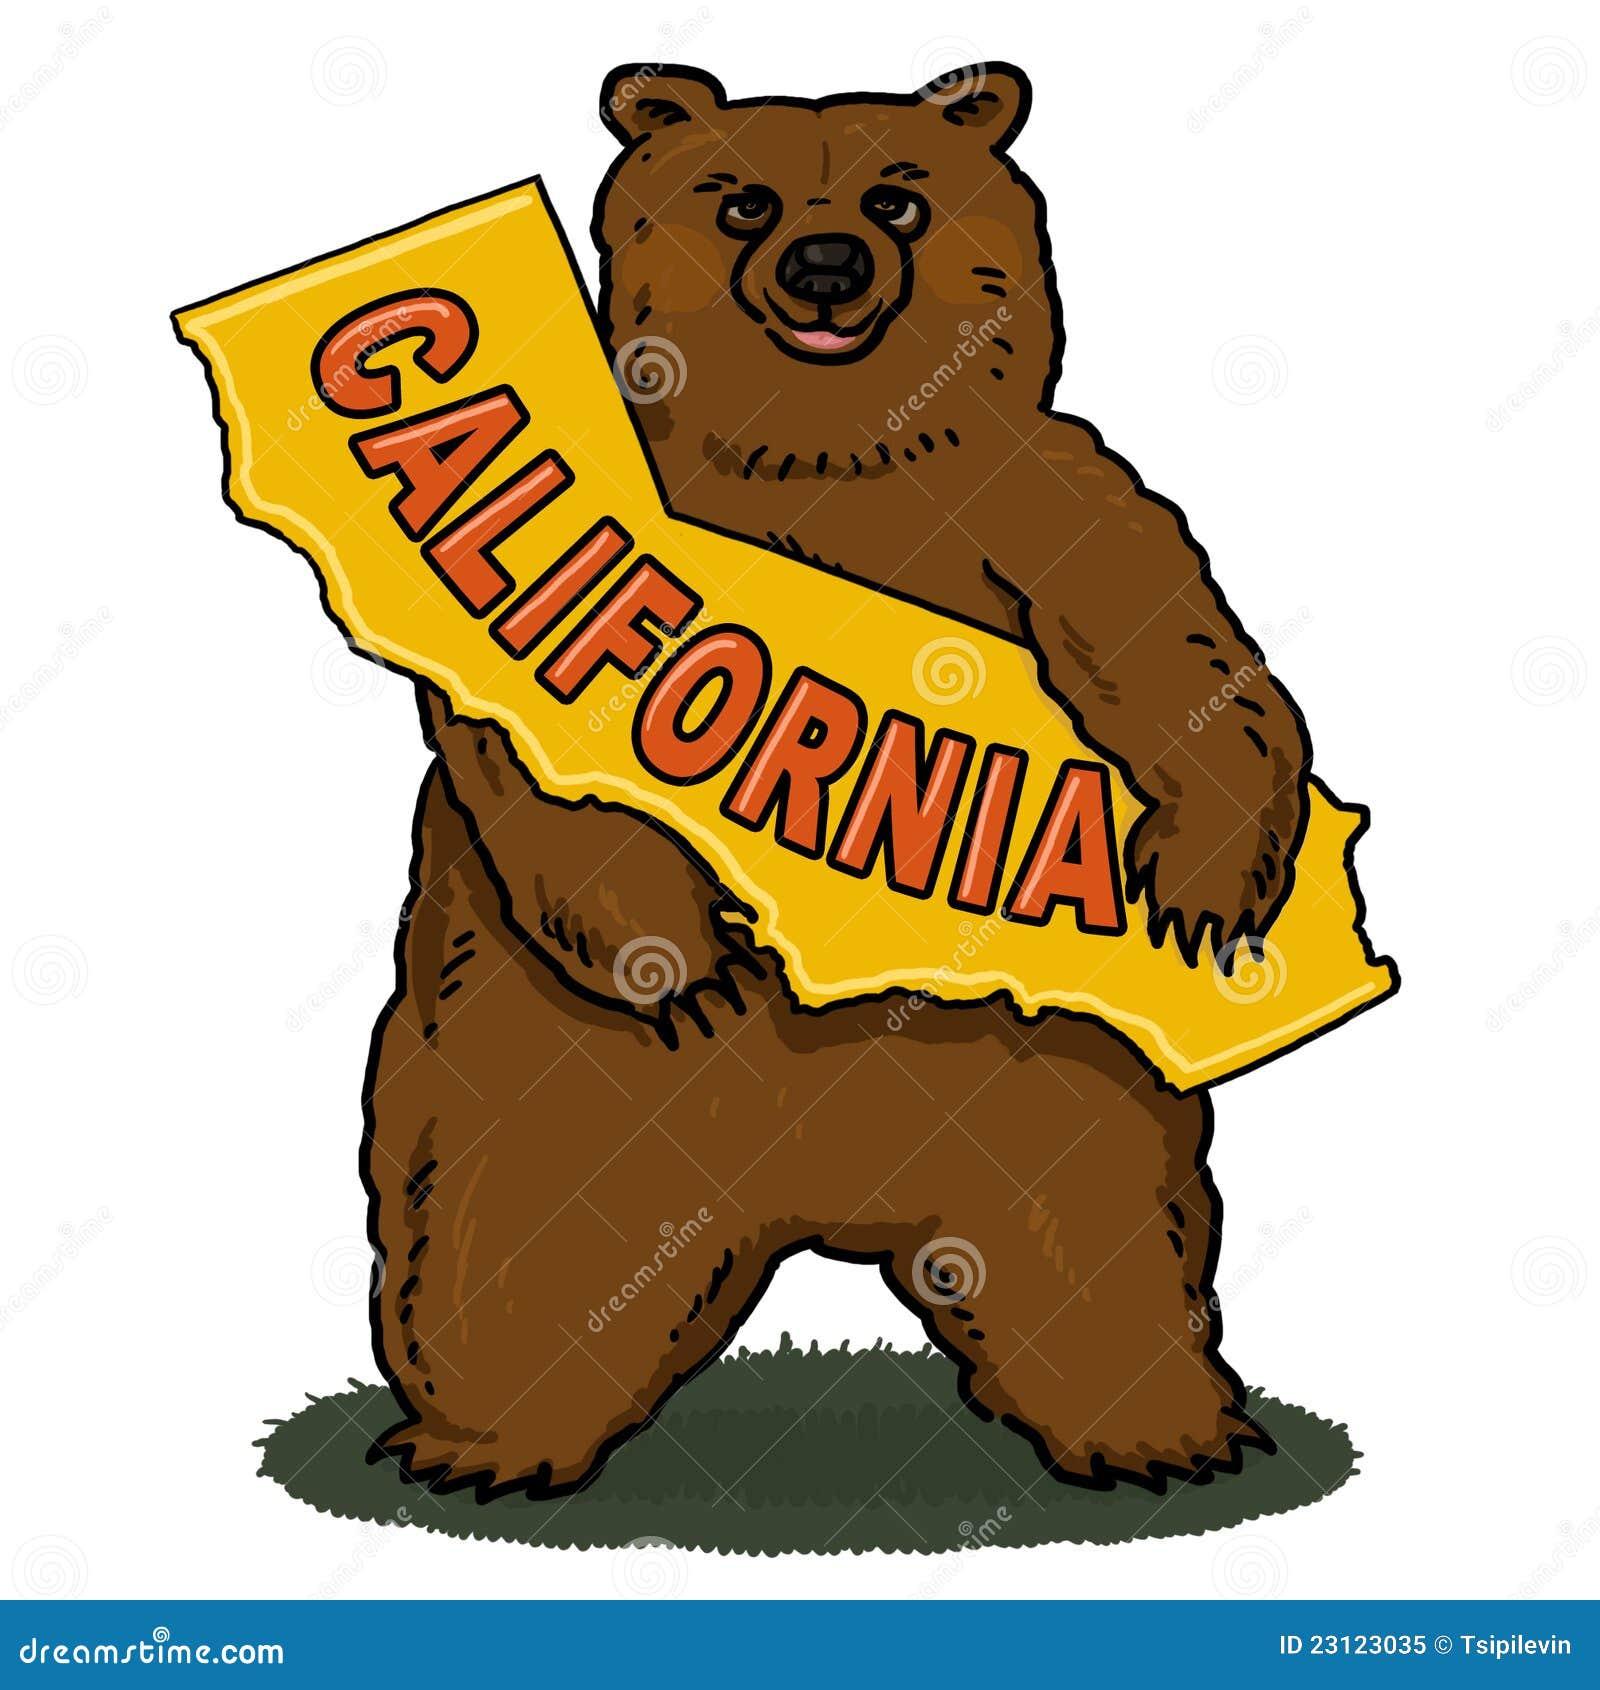 California Map Cartoon.Bear Holding California Map Cartoon Stock Illustration